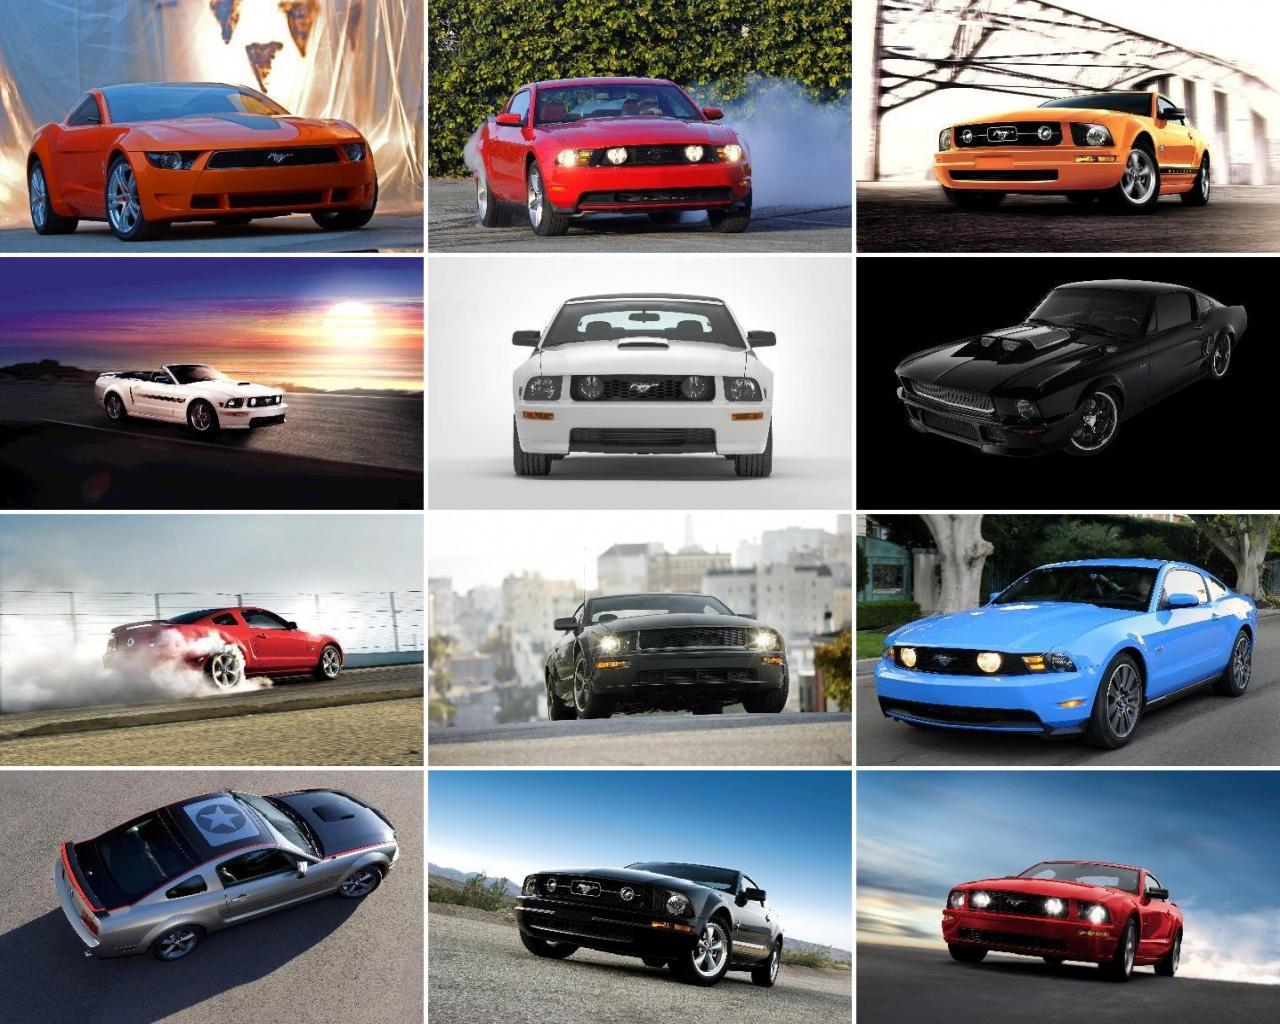 Mustang GT Desktop Wallpaper and Screensavers Downloads 1280x1024